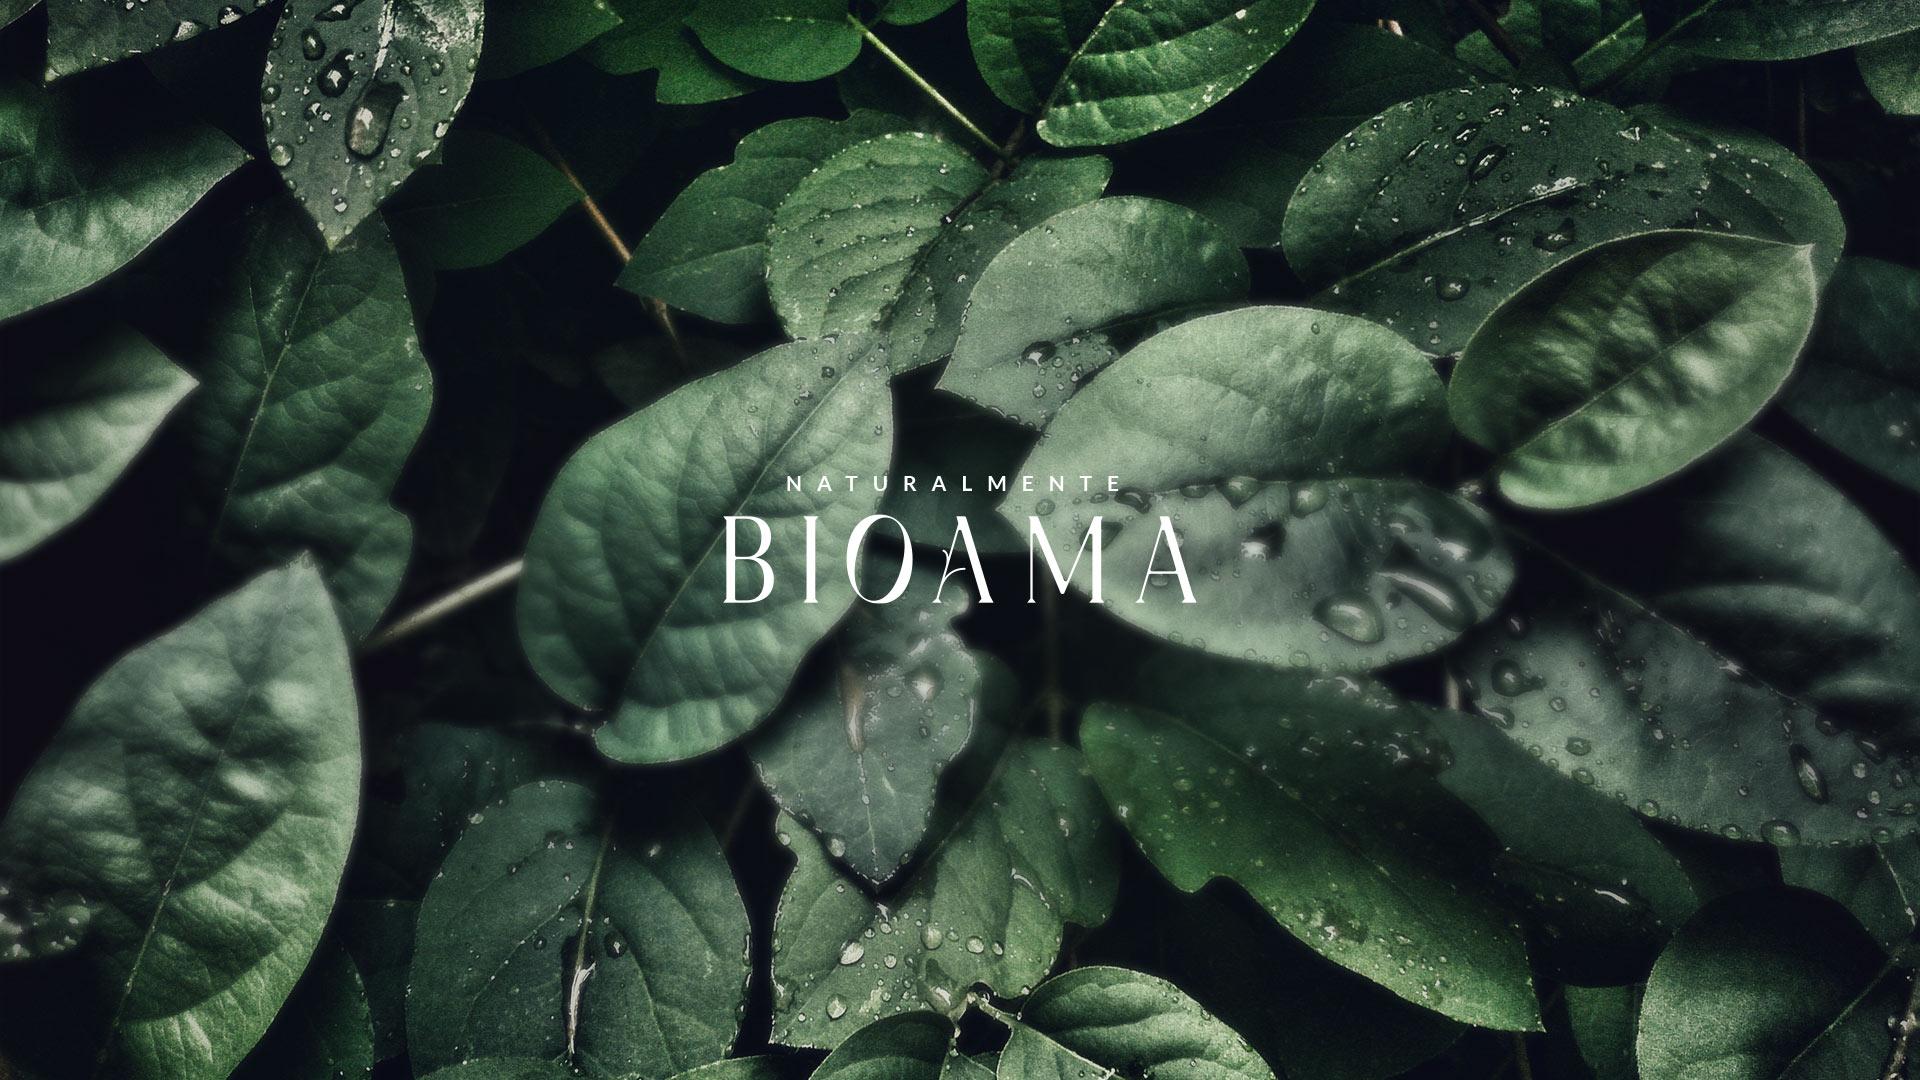 01 bioama logo grafico milano image